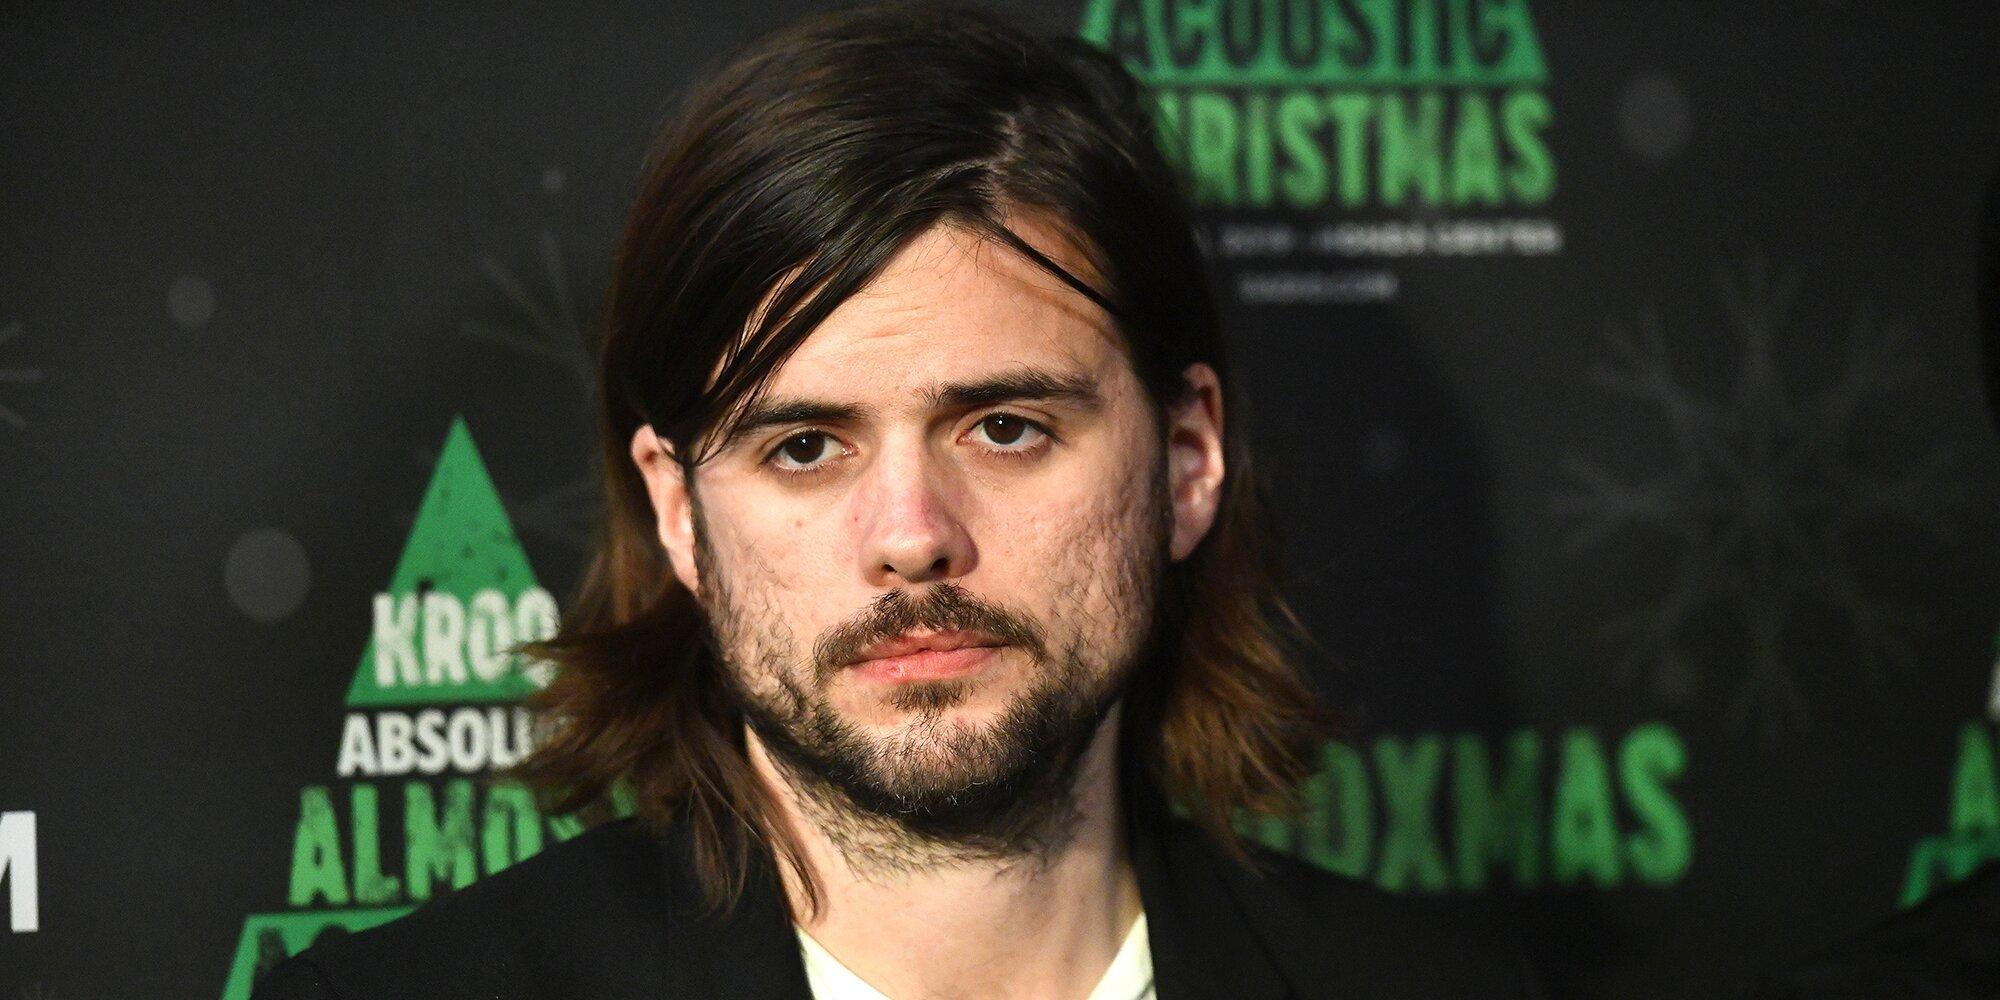 Mumford & Sons member Winston Marshall under fire for praising far-right pundit – Entertainment Weekly